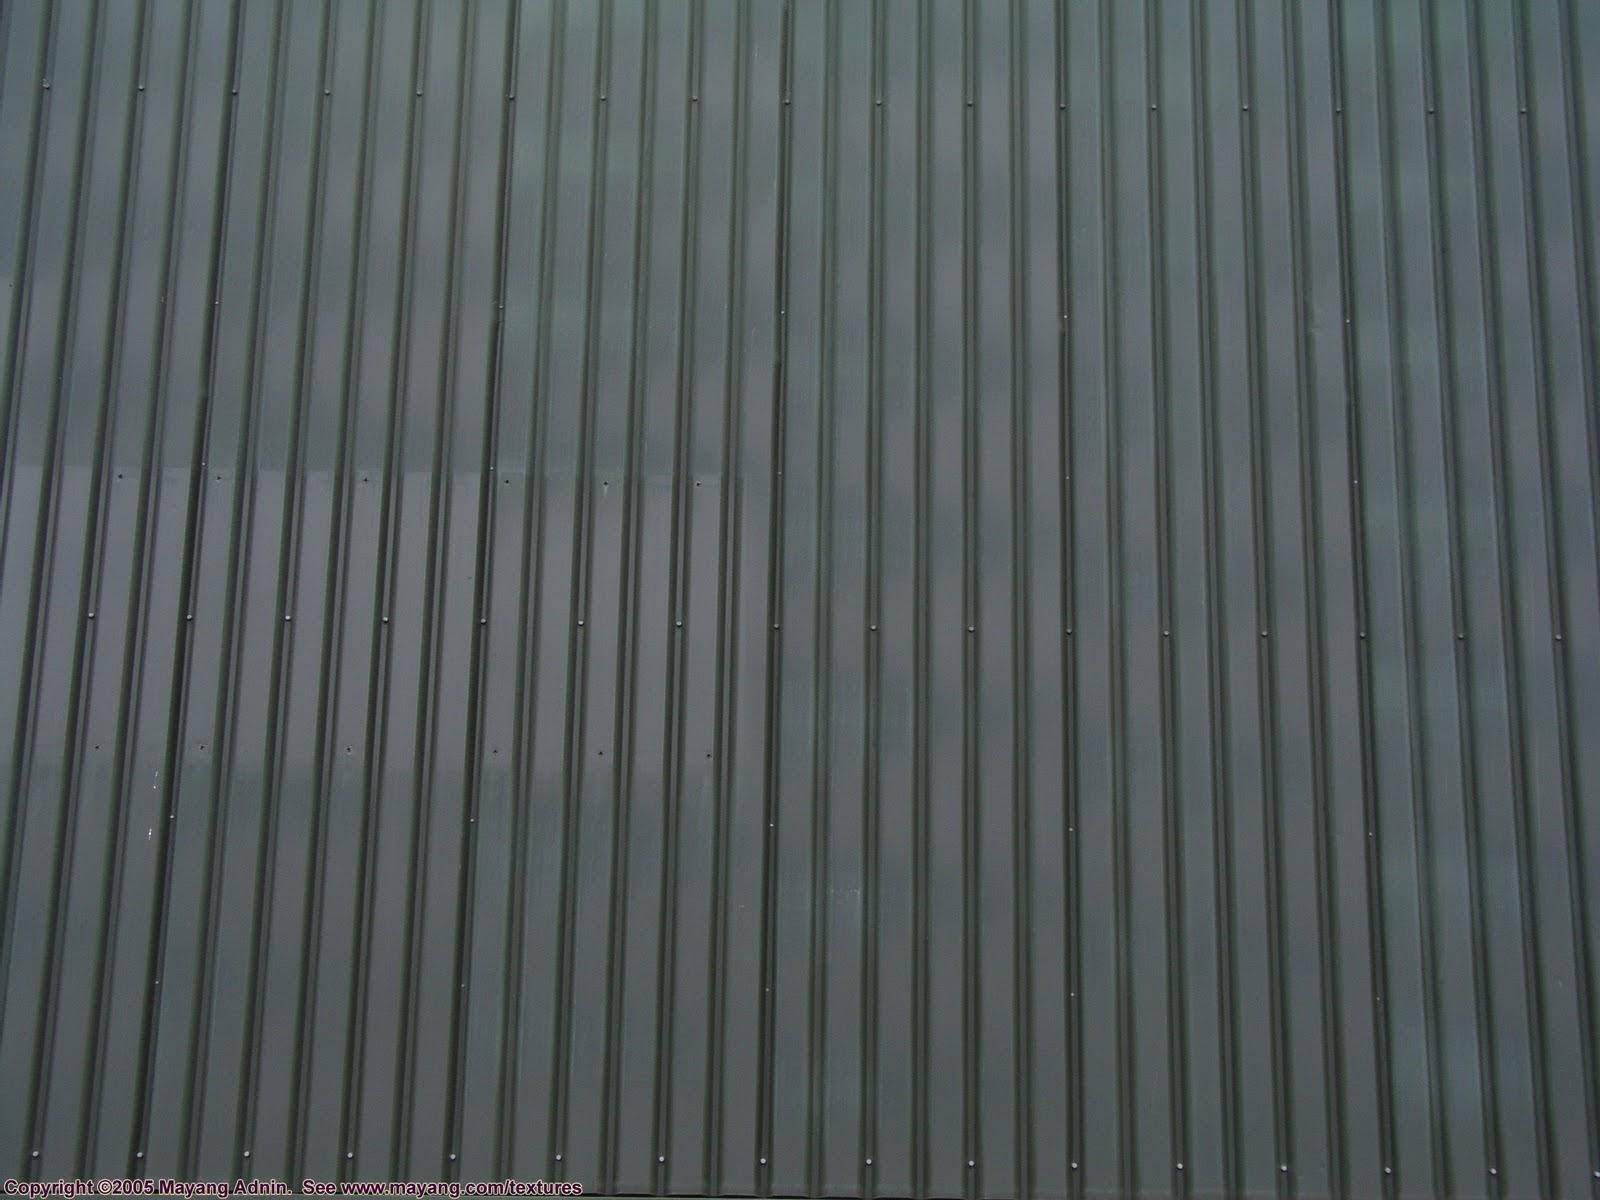 Kayleigh Dean Cg Arts Blog Barn Roof Texturing